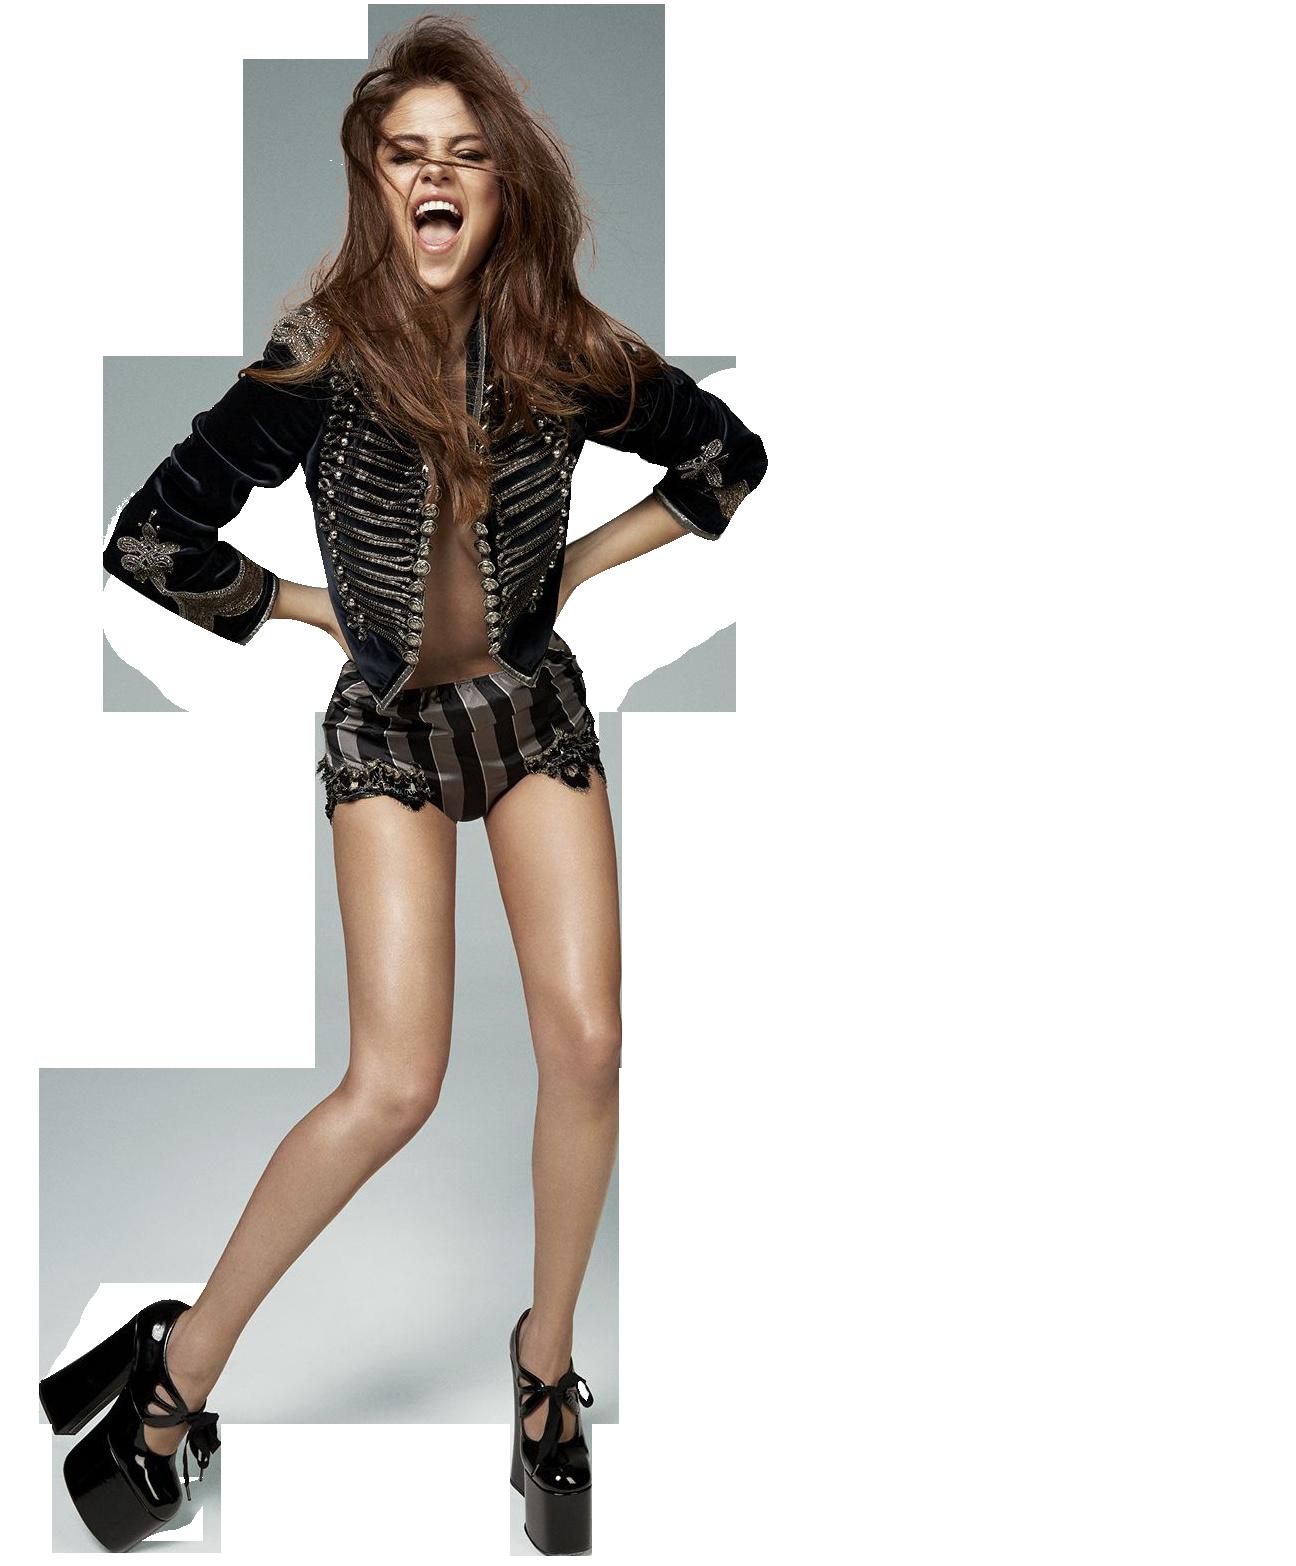 Selena Gomez In Shorts PNG Image